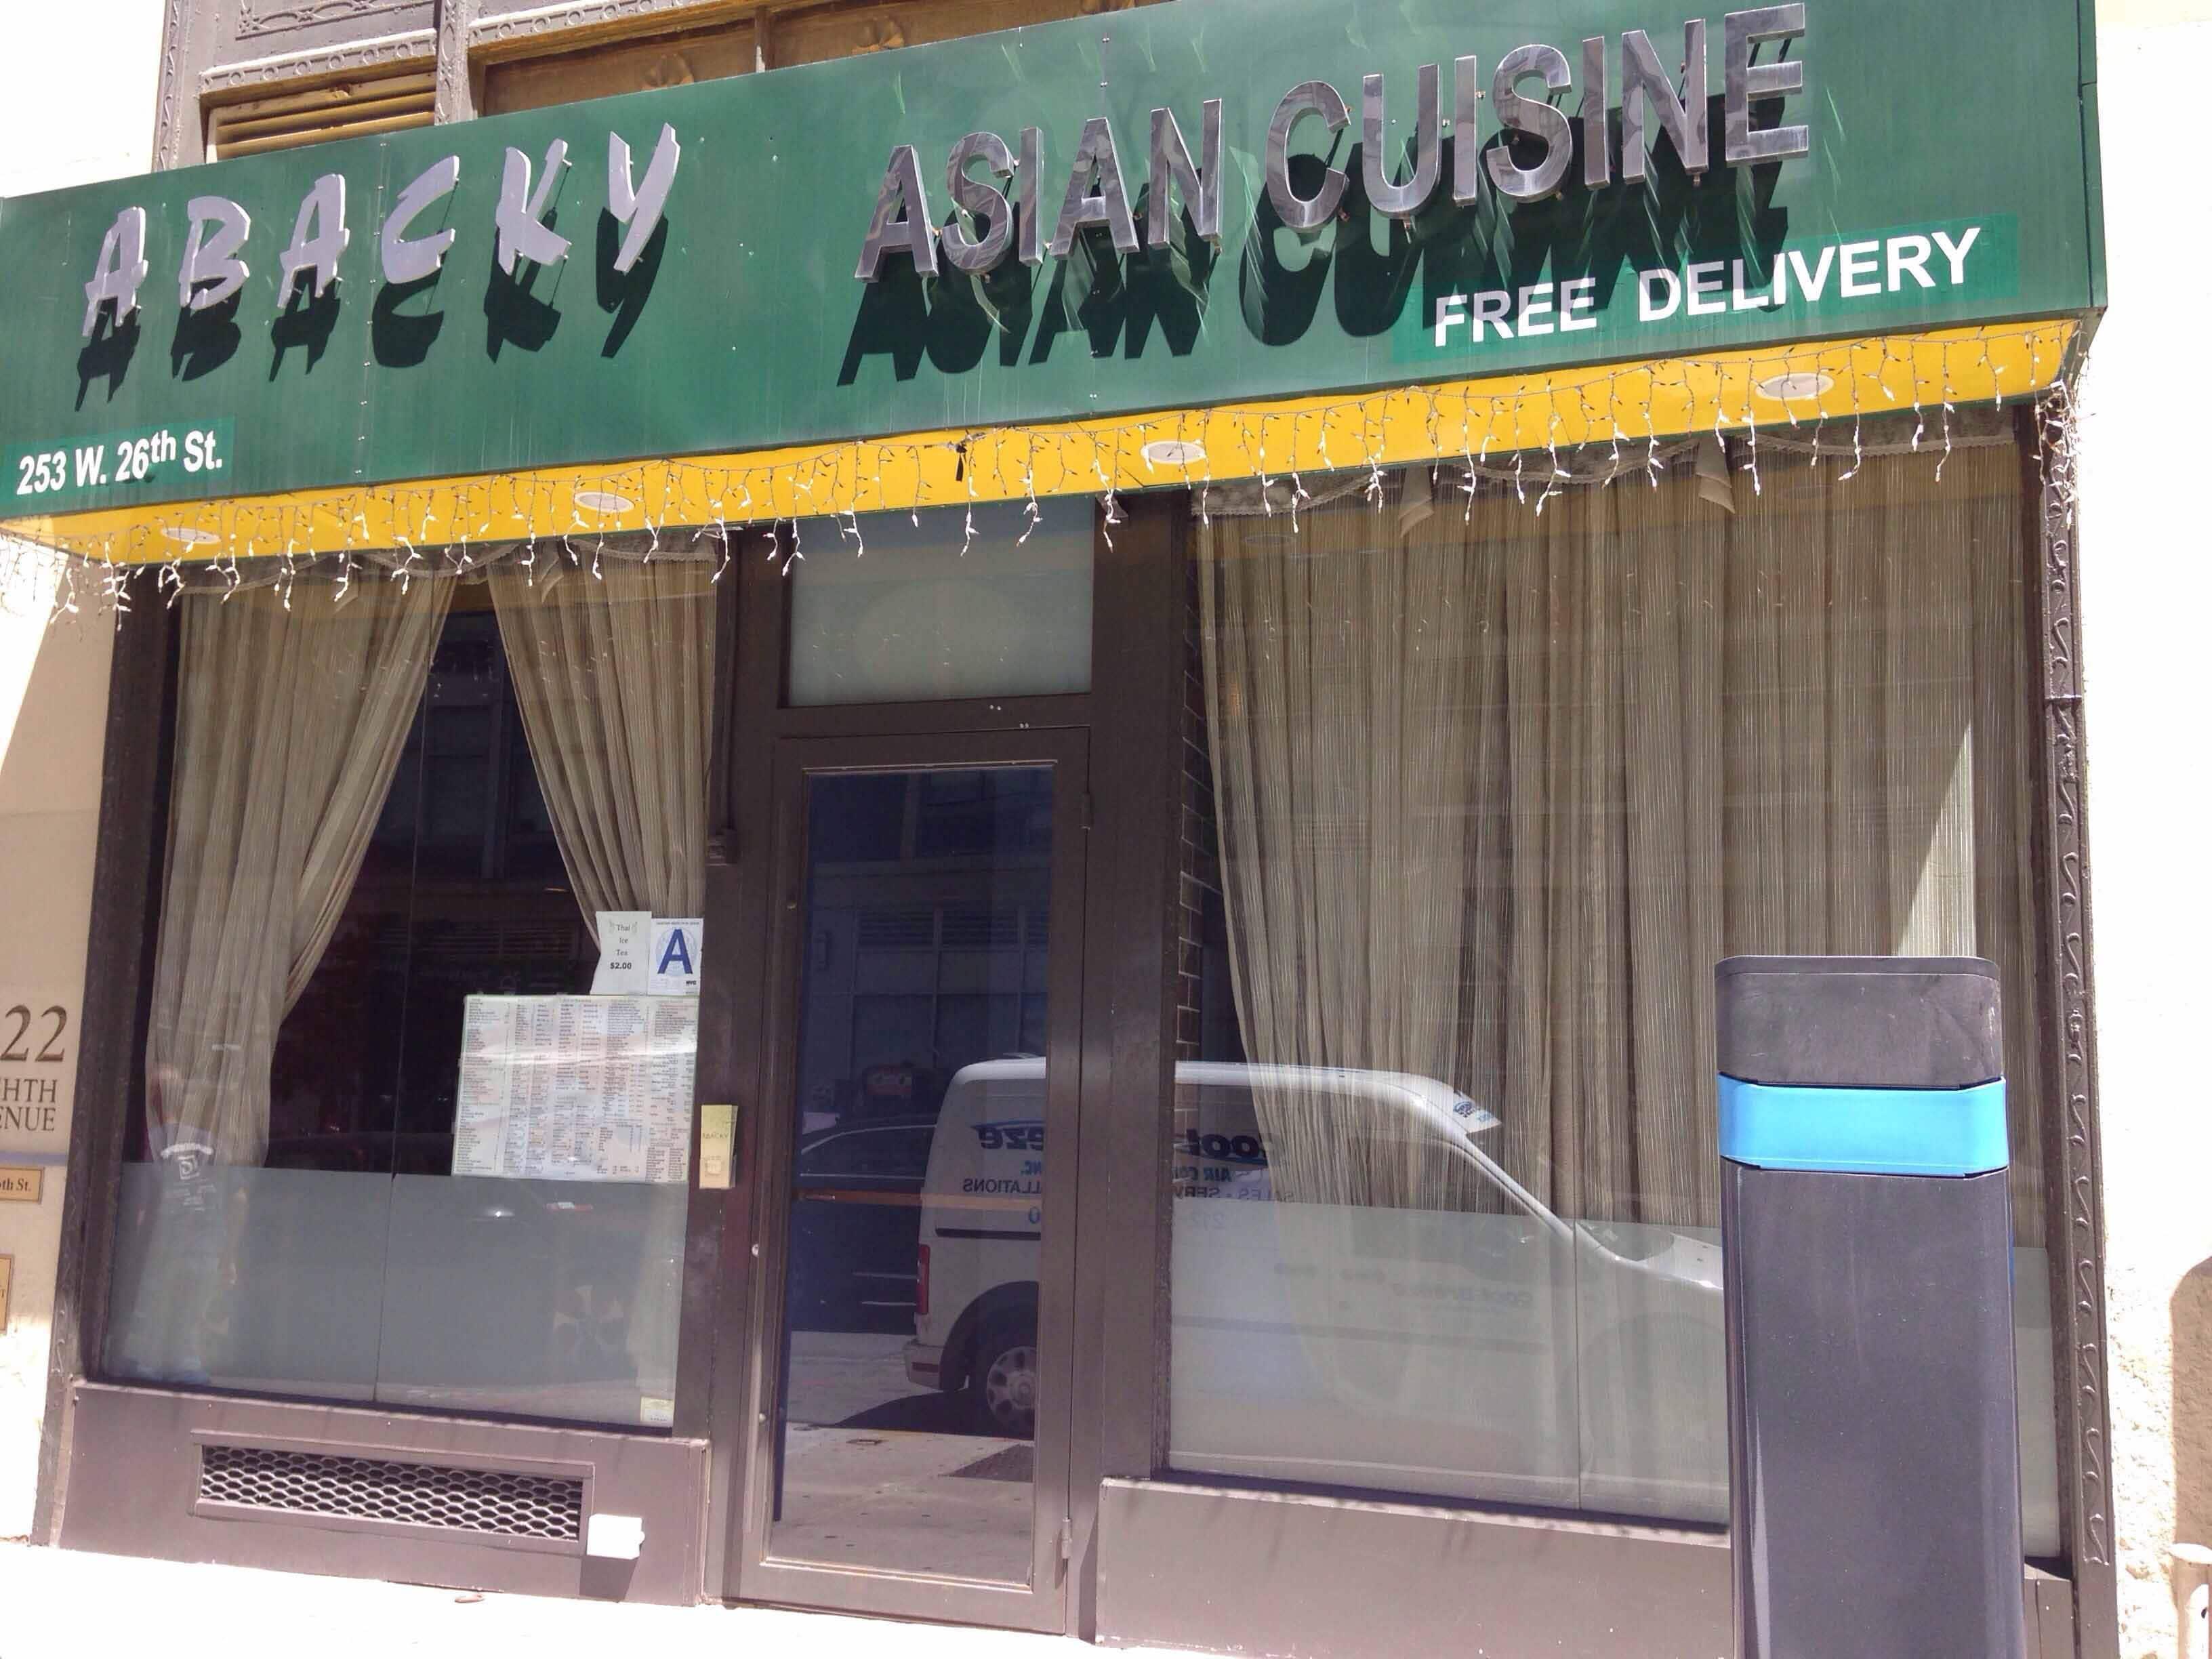 Abacky fusion cuisine hot